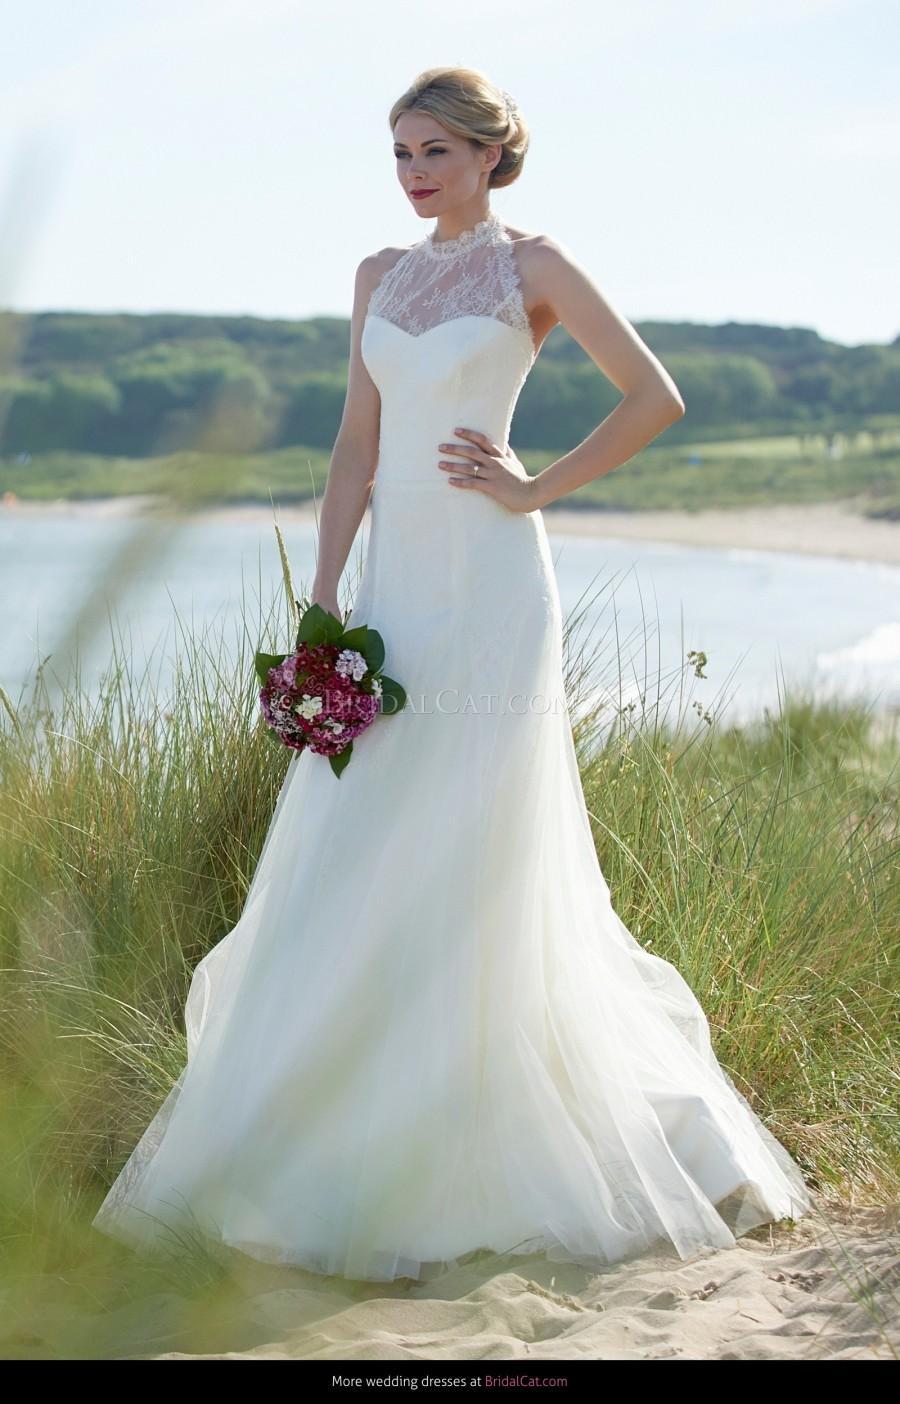 Свадьба - Stephanie Allin Always and Forever Alexa - Fantastische Brautkleider